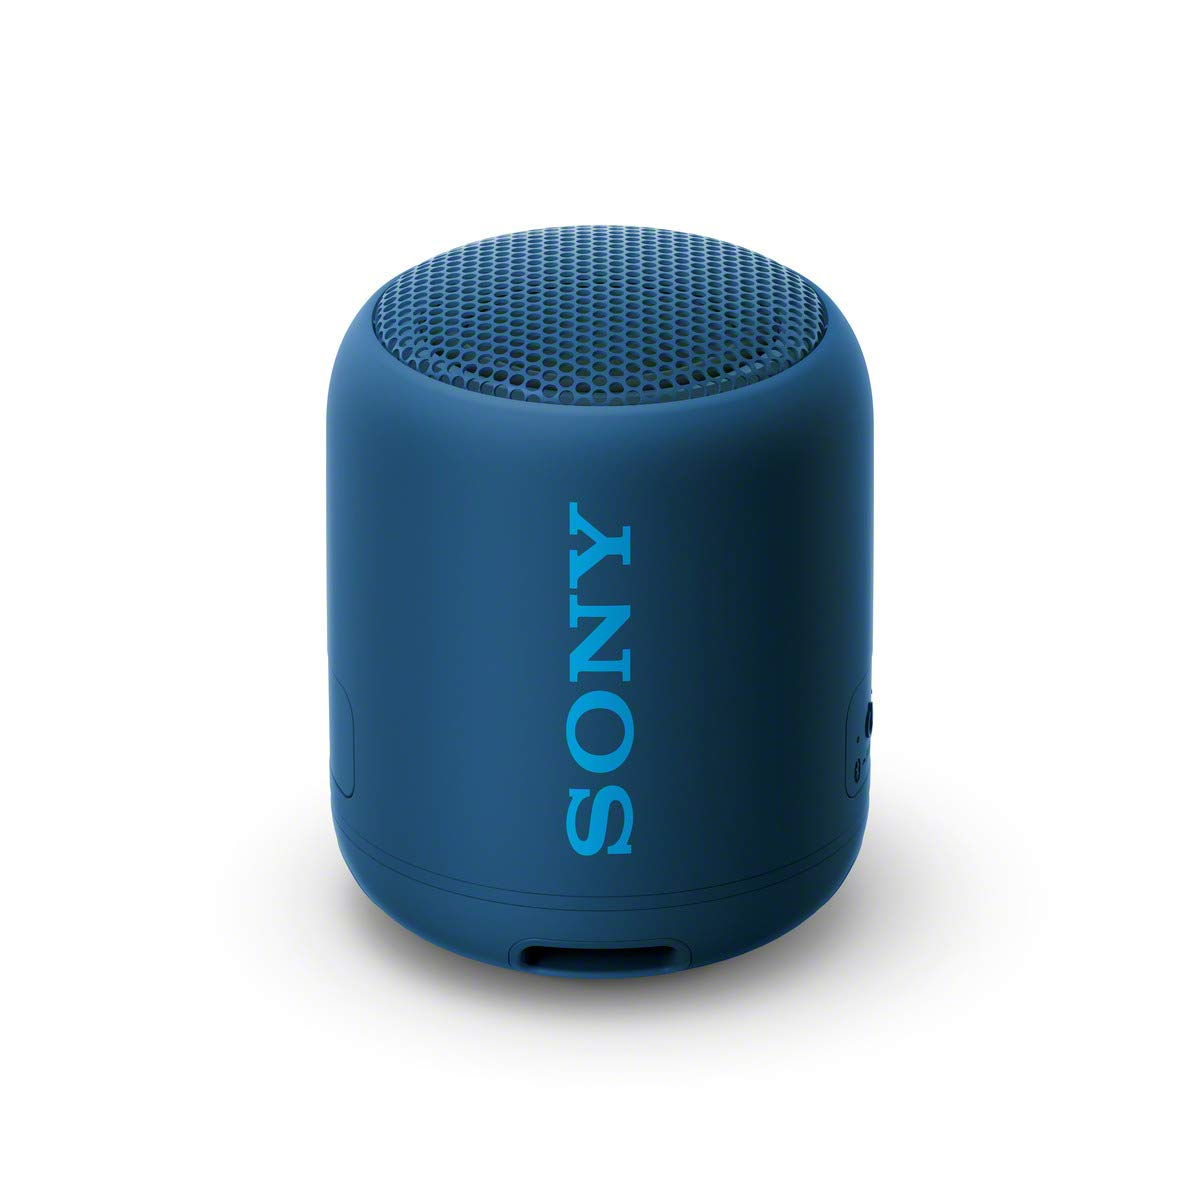 Sony SRS-XB12 – Altavoz inalámbrico portátil (Bluetooth, Extra Bass, diseño portátil, batería hasta 16h, Resistente al Agua y Polvo IP67)